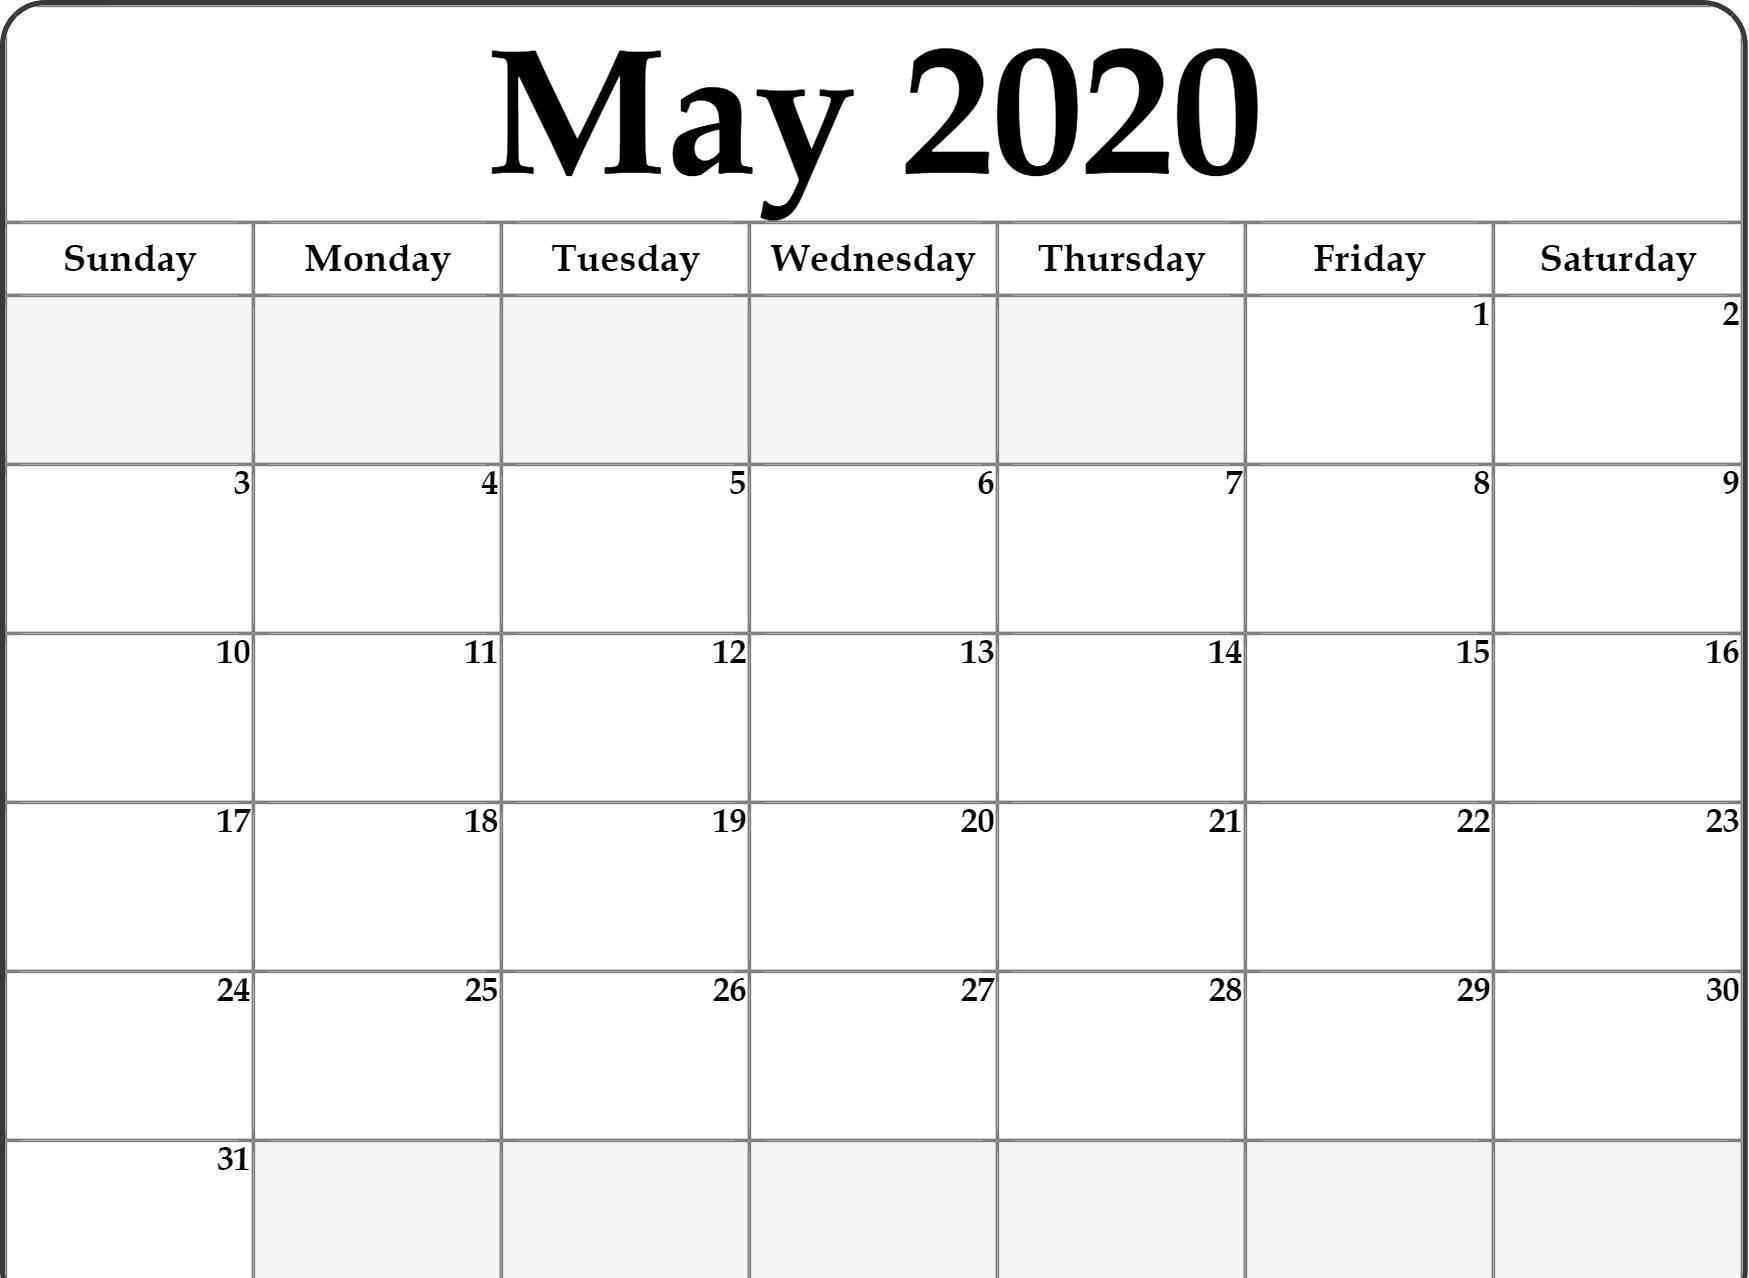 2020 Printable Fill In Calendar - Calendar Inspiration Design Fill In And Print Calendars